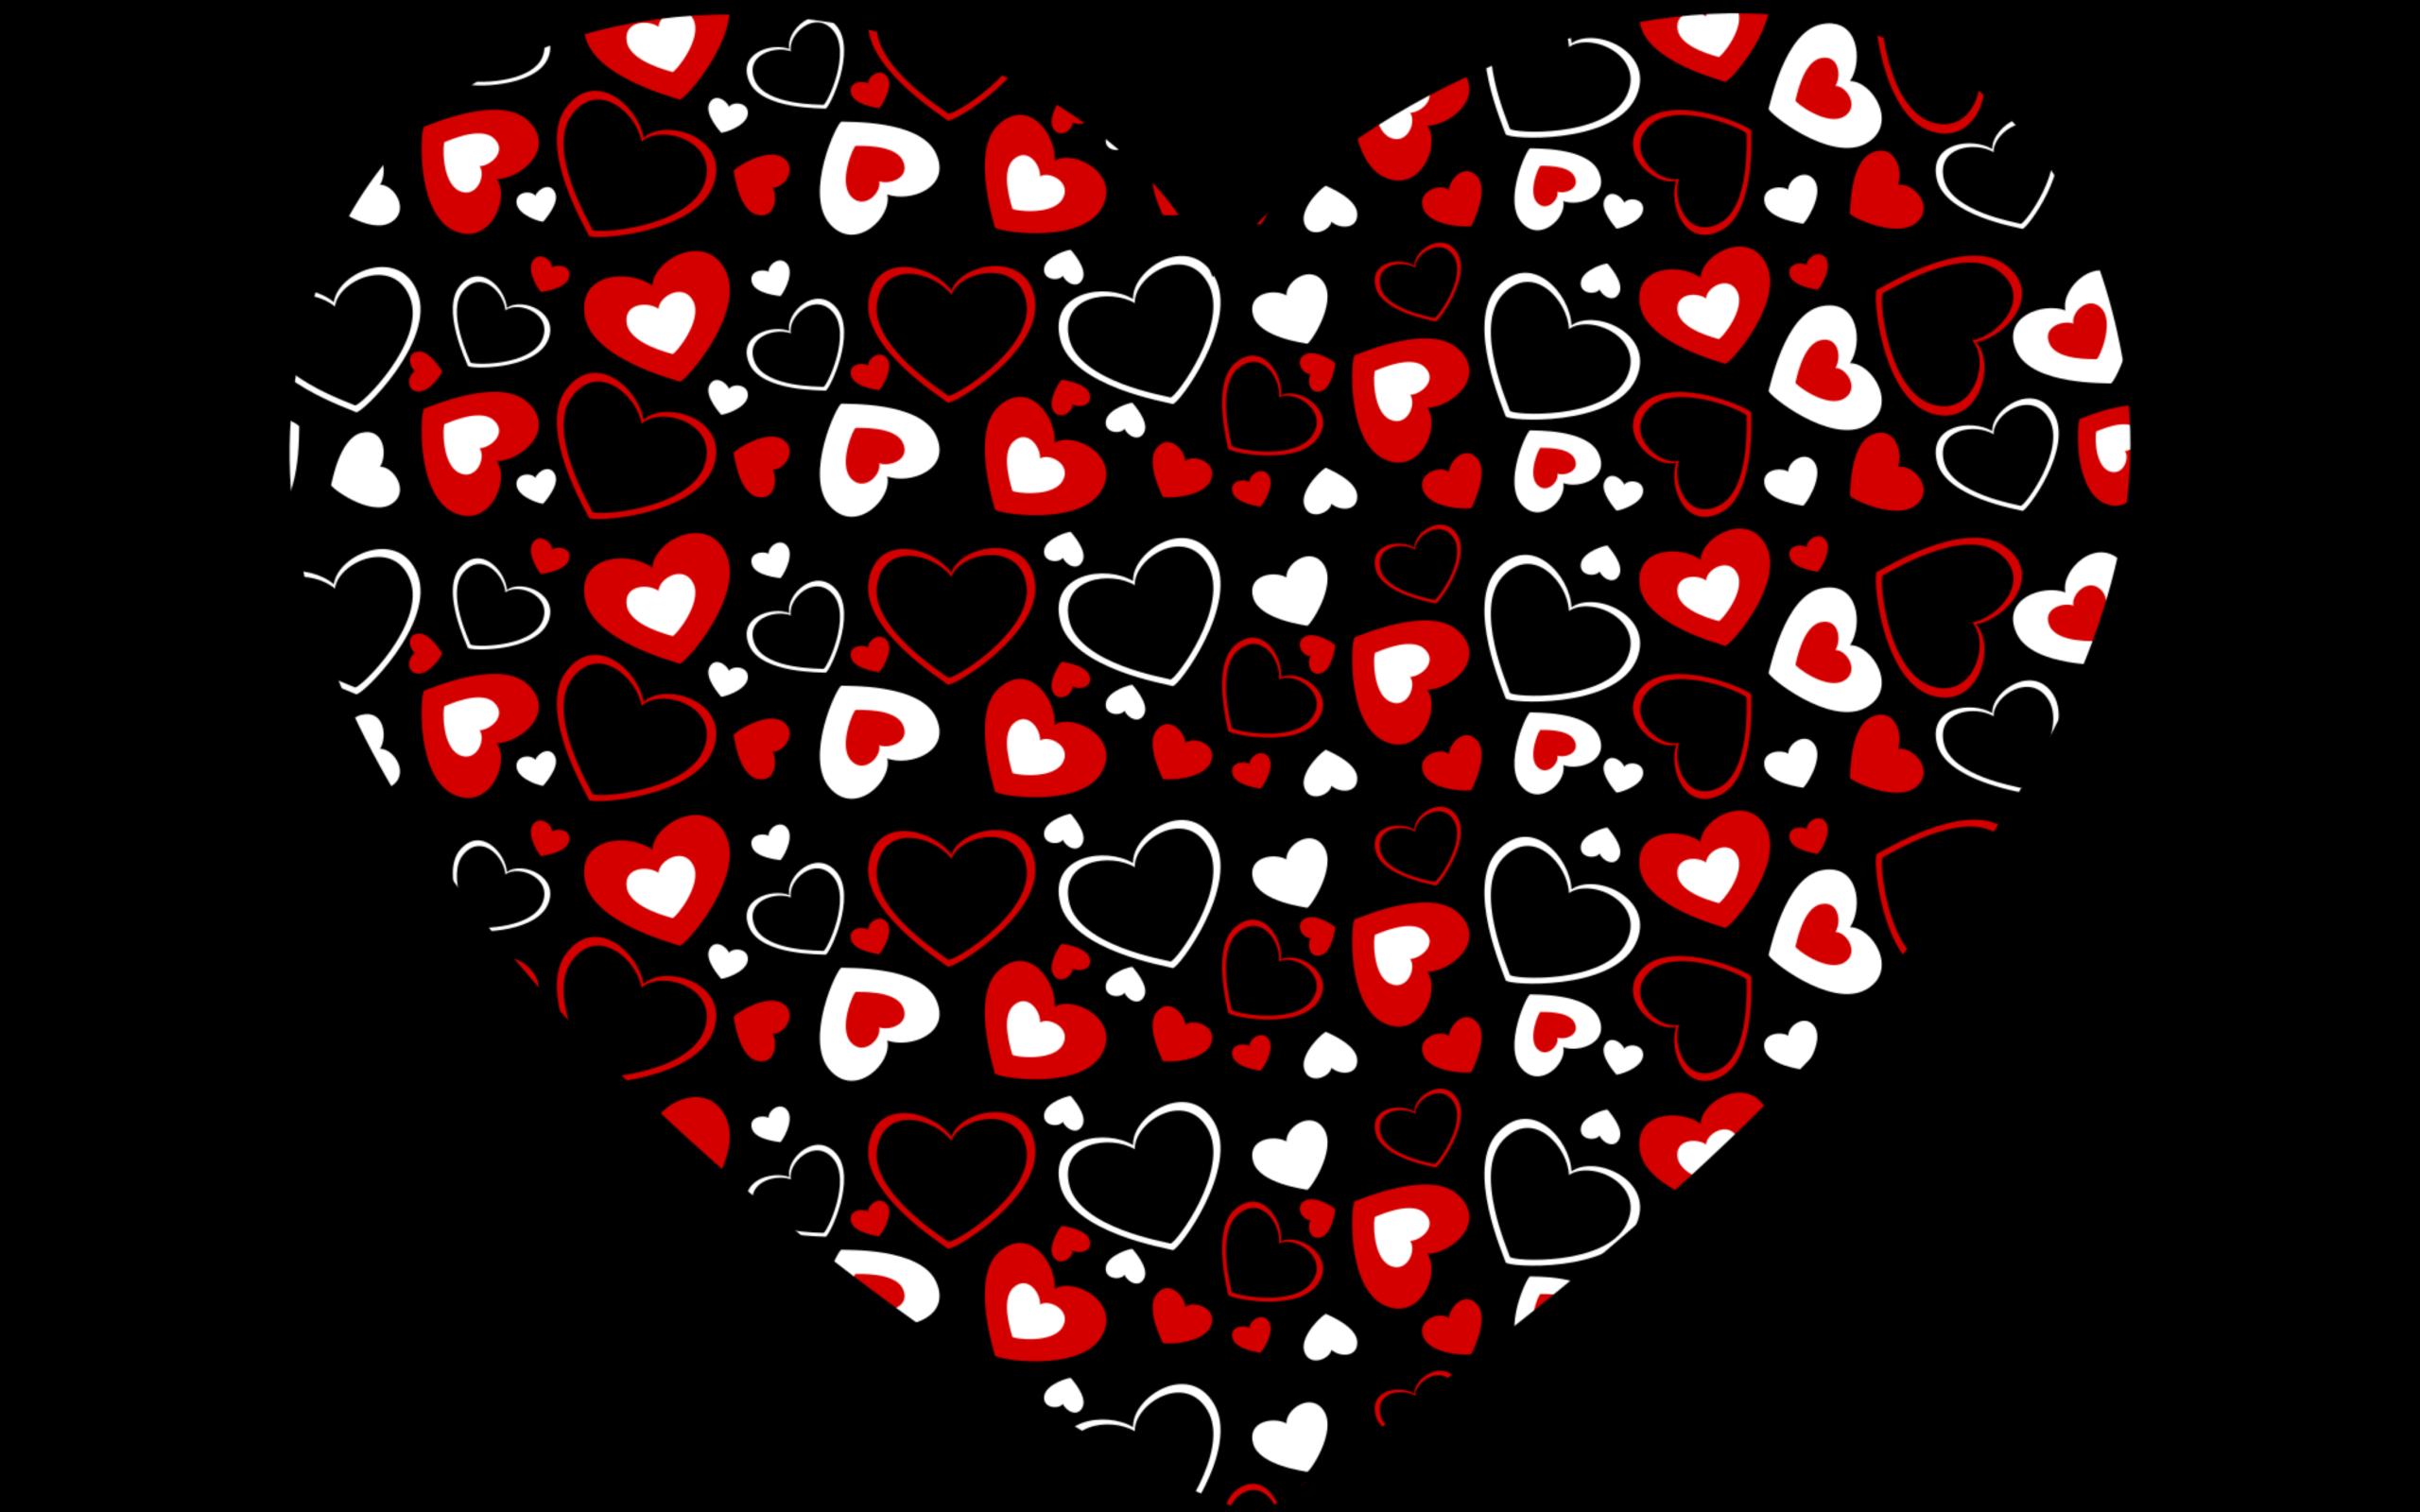 обои сердечко на черном фоне родилась